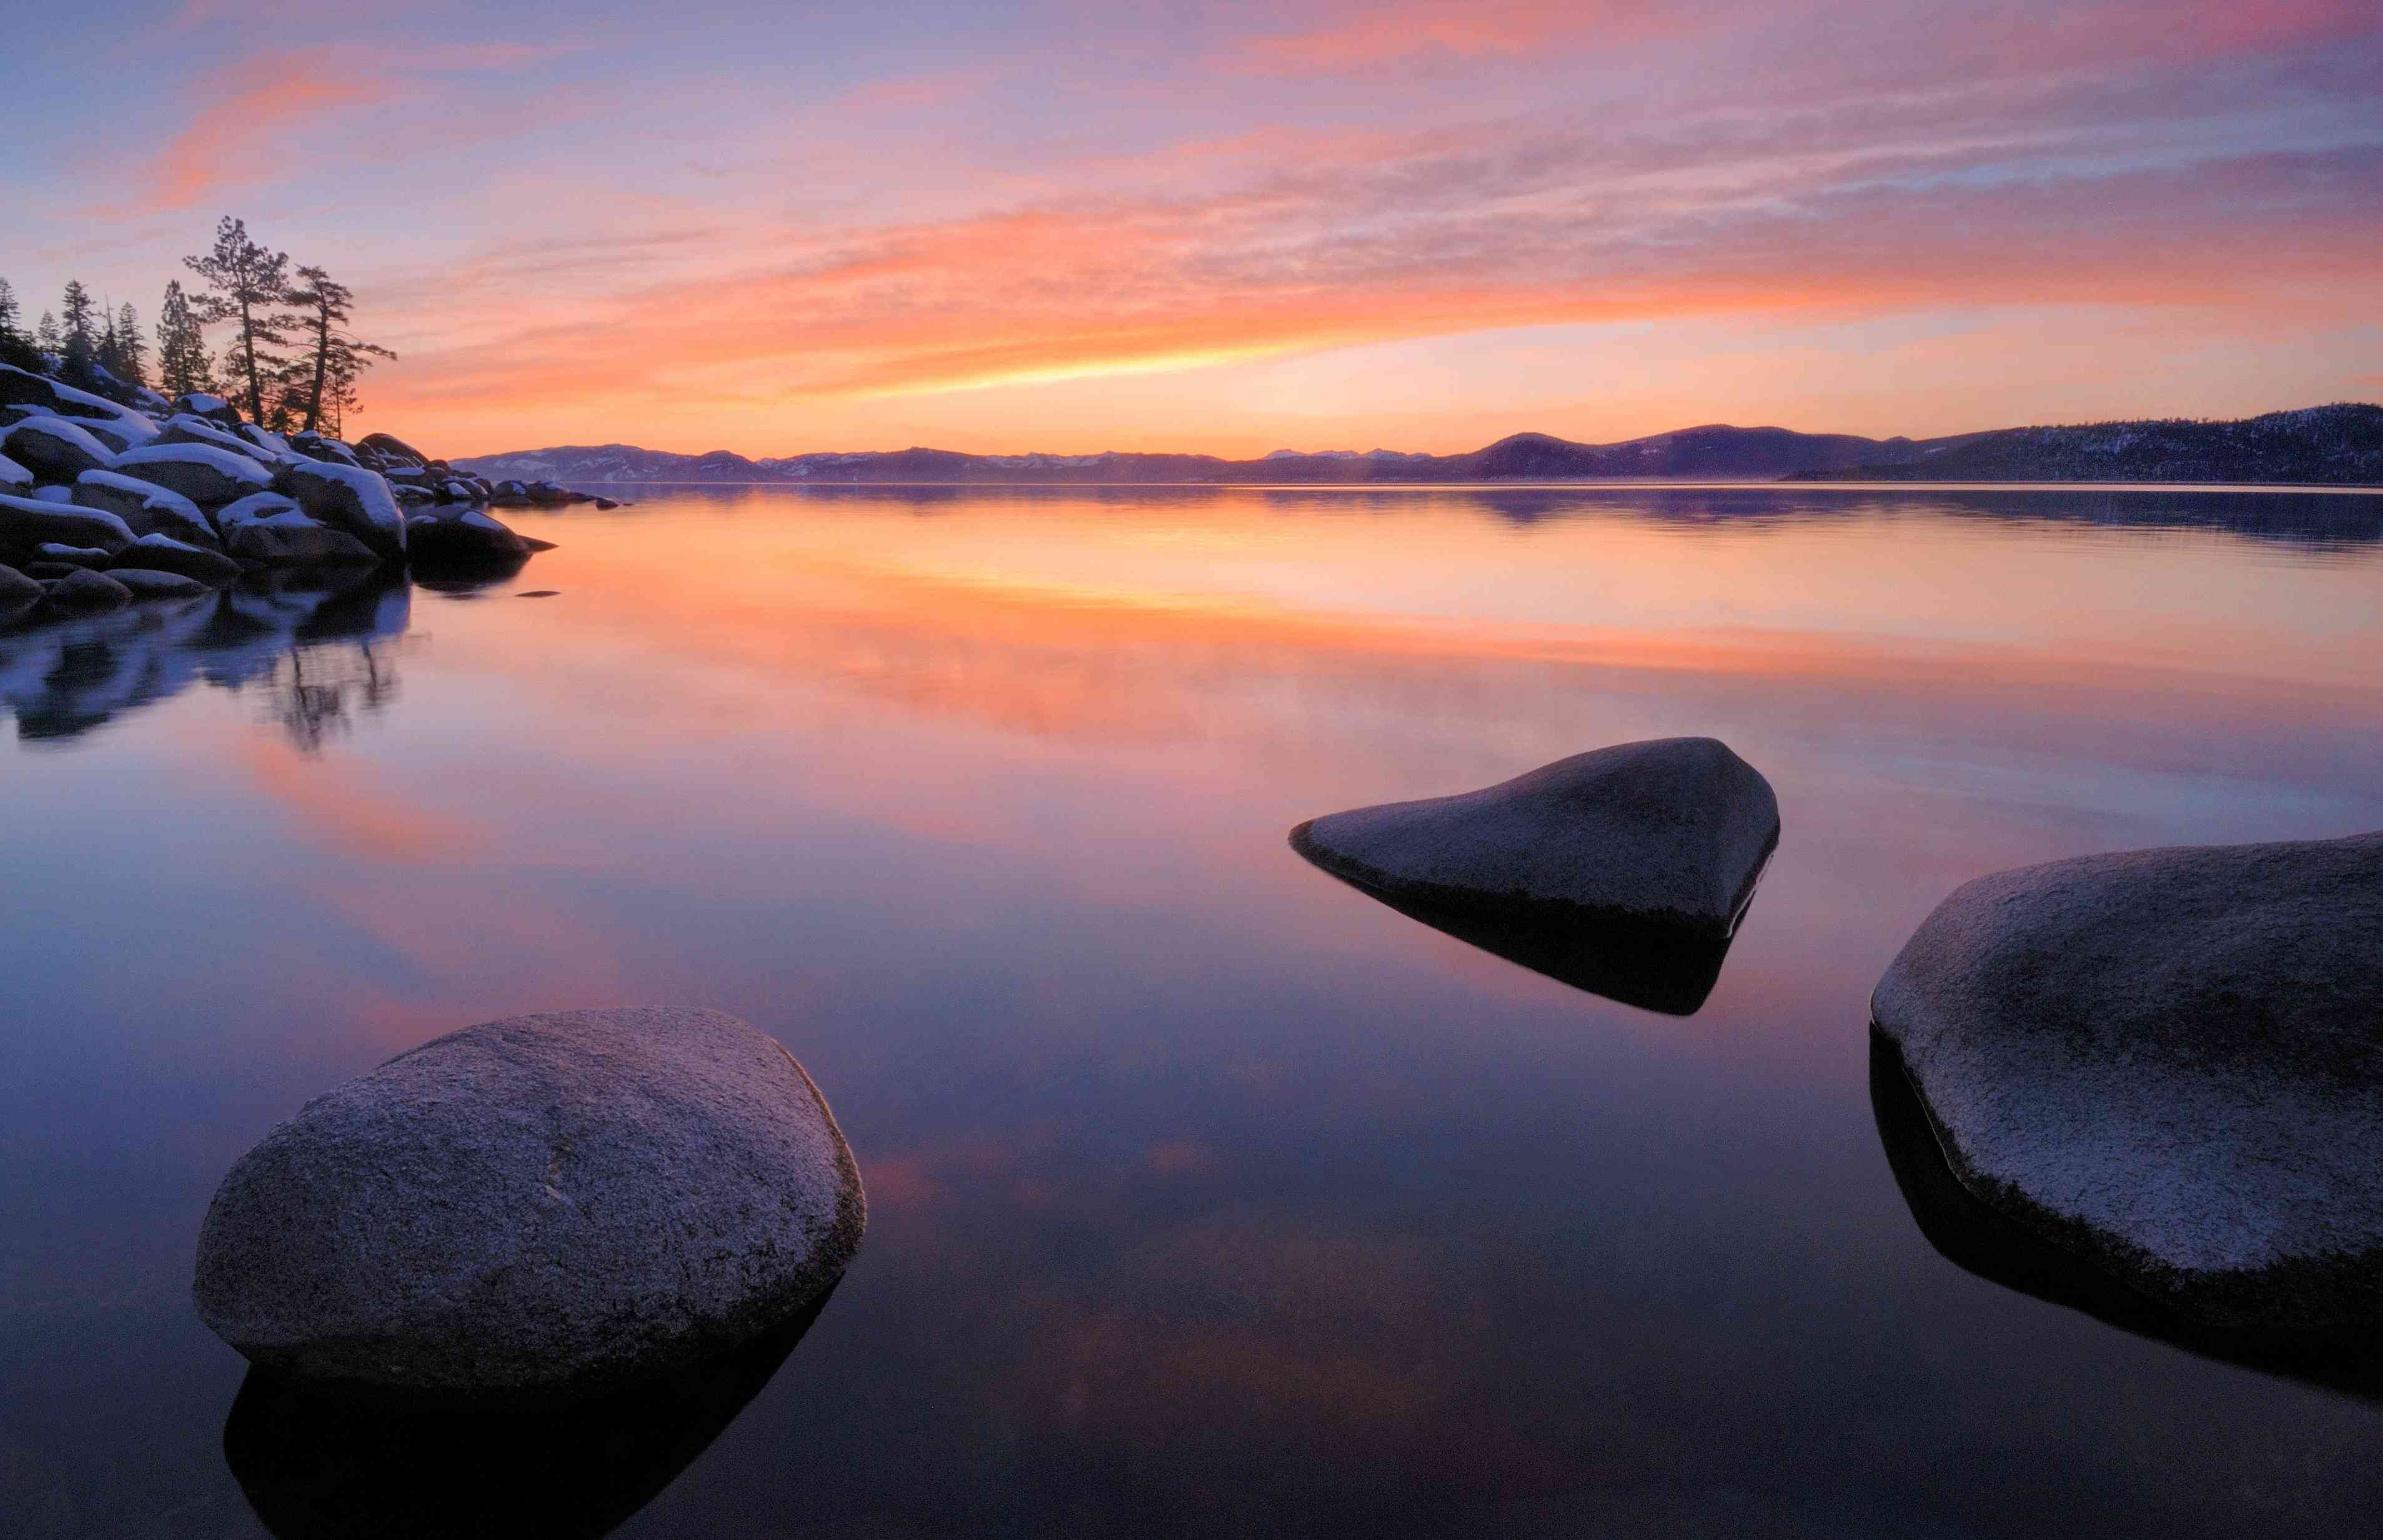 Sand Harbor at sunset Lake Tahoe State Park, Nevada